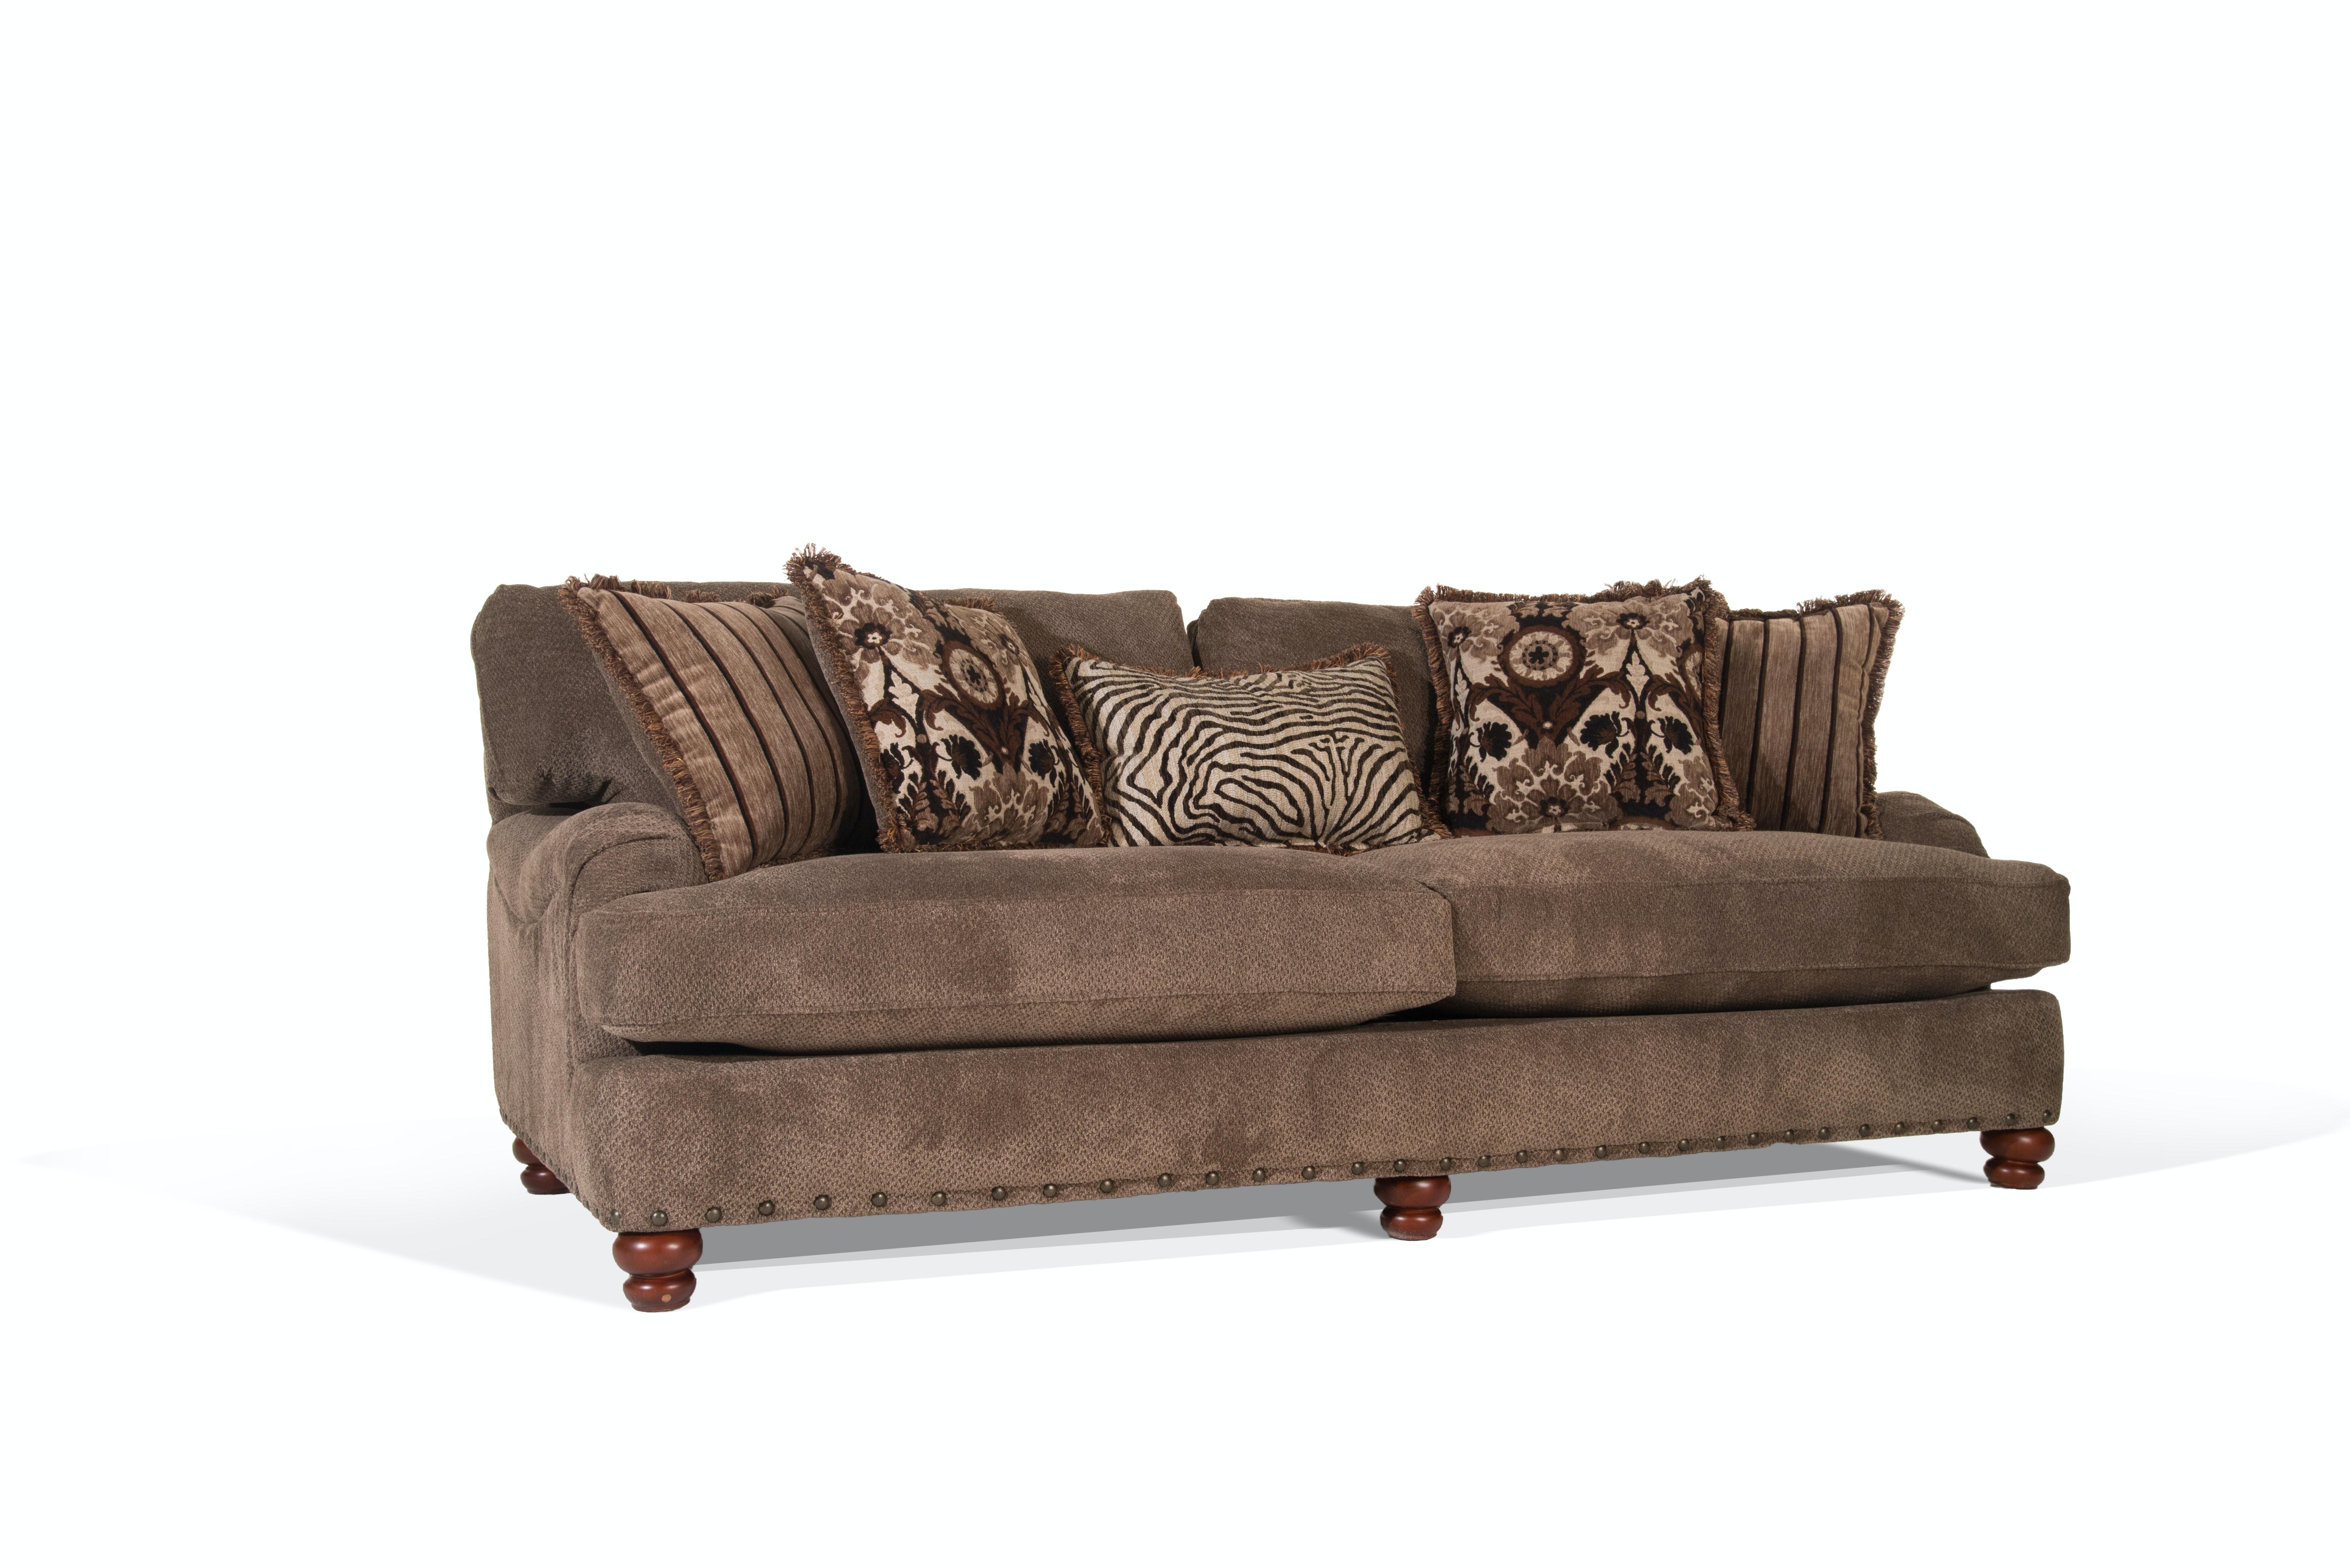 High Quality Corinthian Prodigy Sofa UPH SOFA PRODIGY